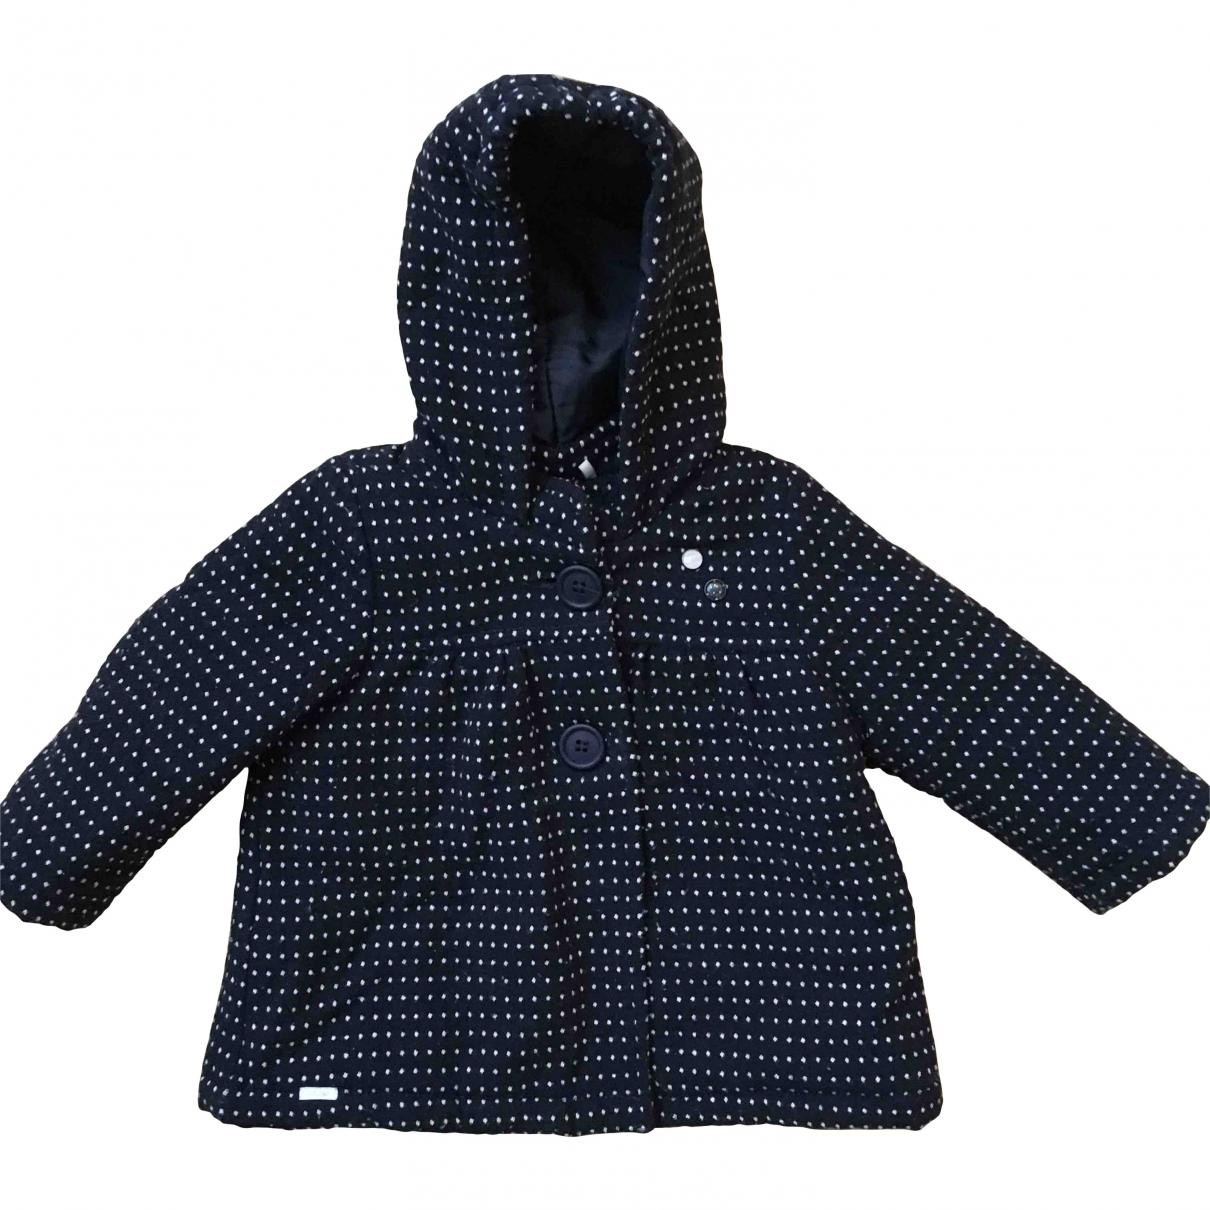 Ikks \N Navy Wool jacket & coat for Kids 18 months - up to 81cm FR